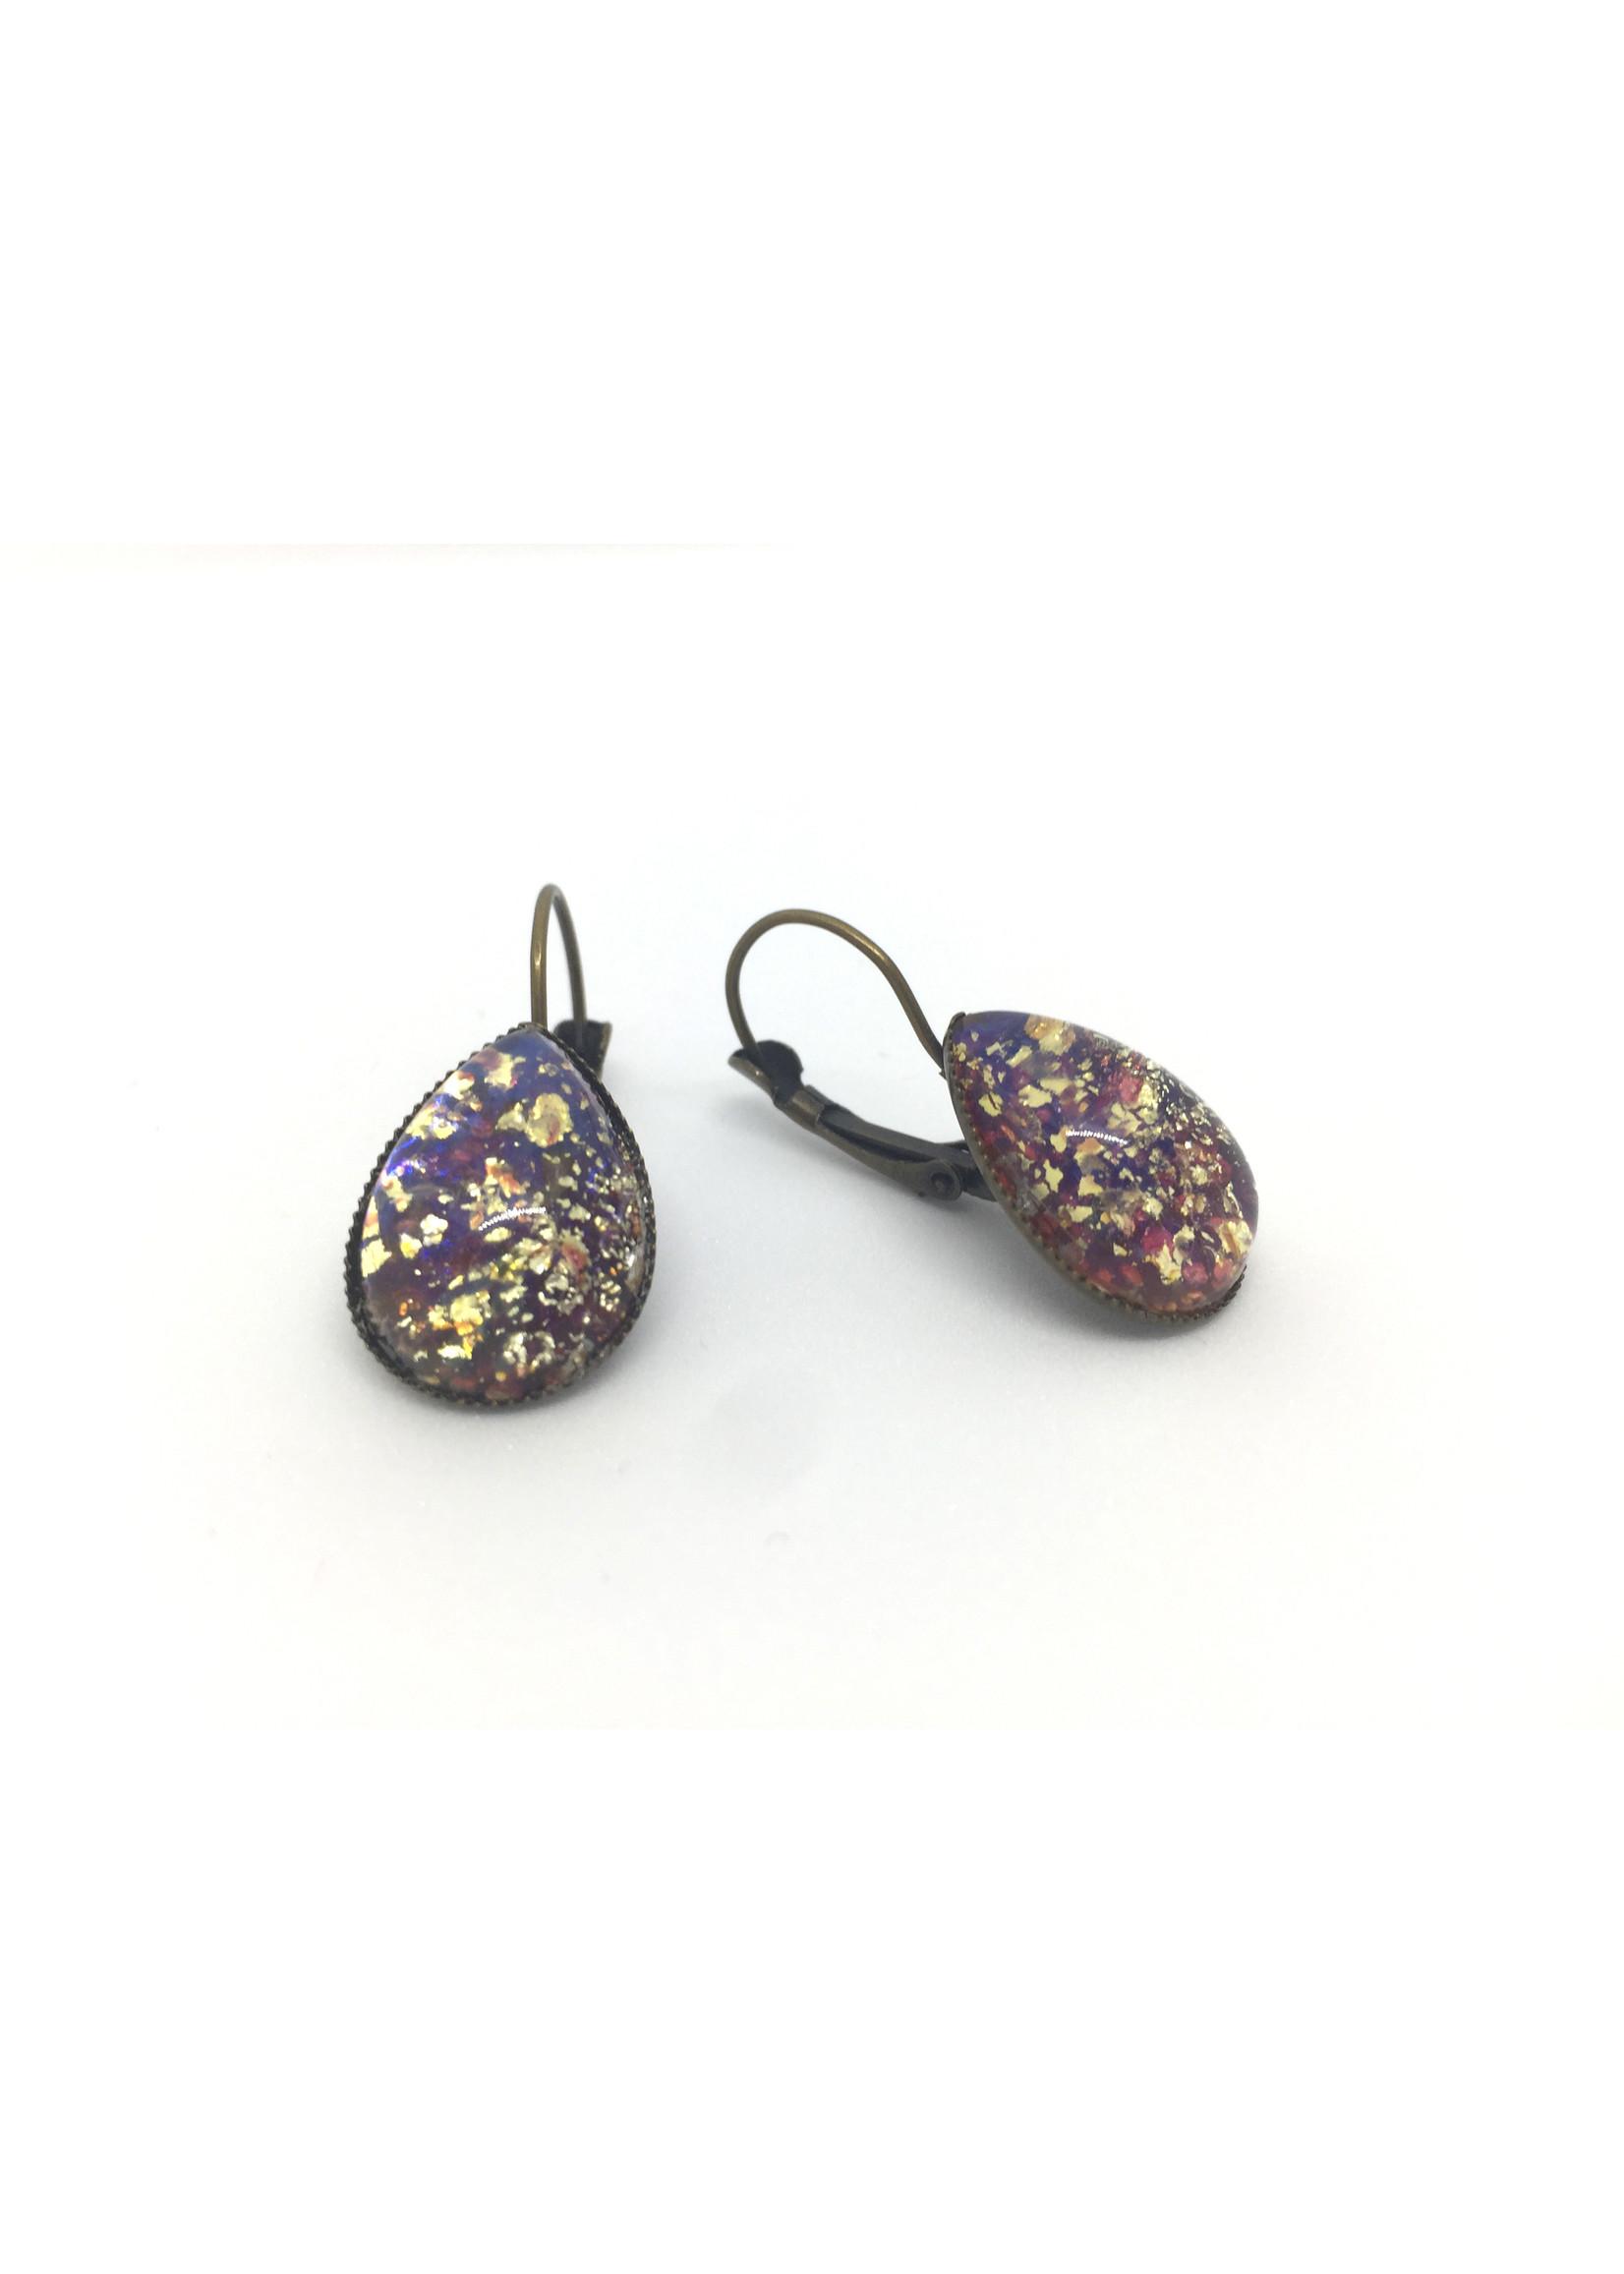 Els de Ruyter earrings with vintage stones